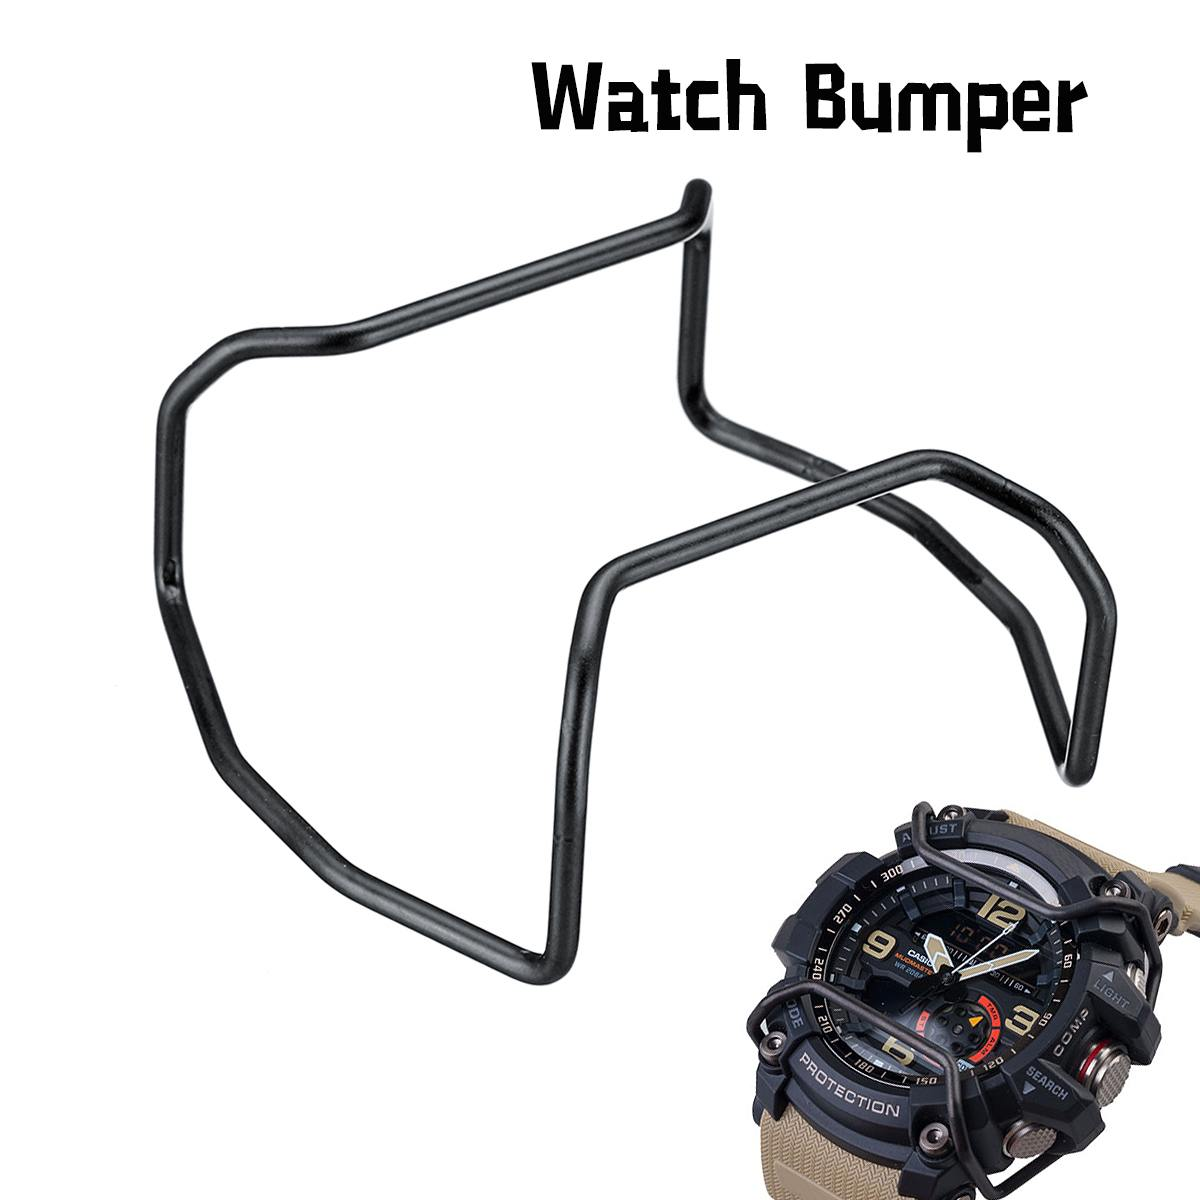 1Pc Matte Black Watch Bumper Case Protector Wire Guards